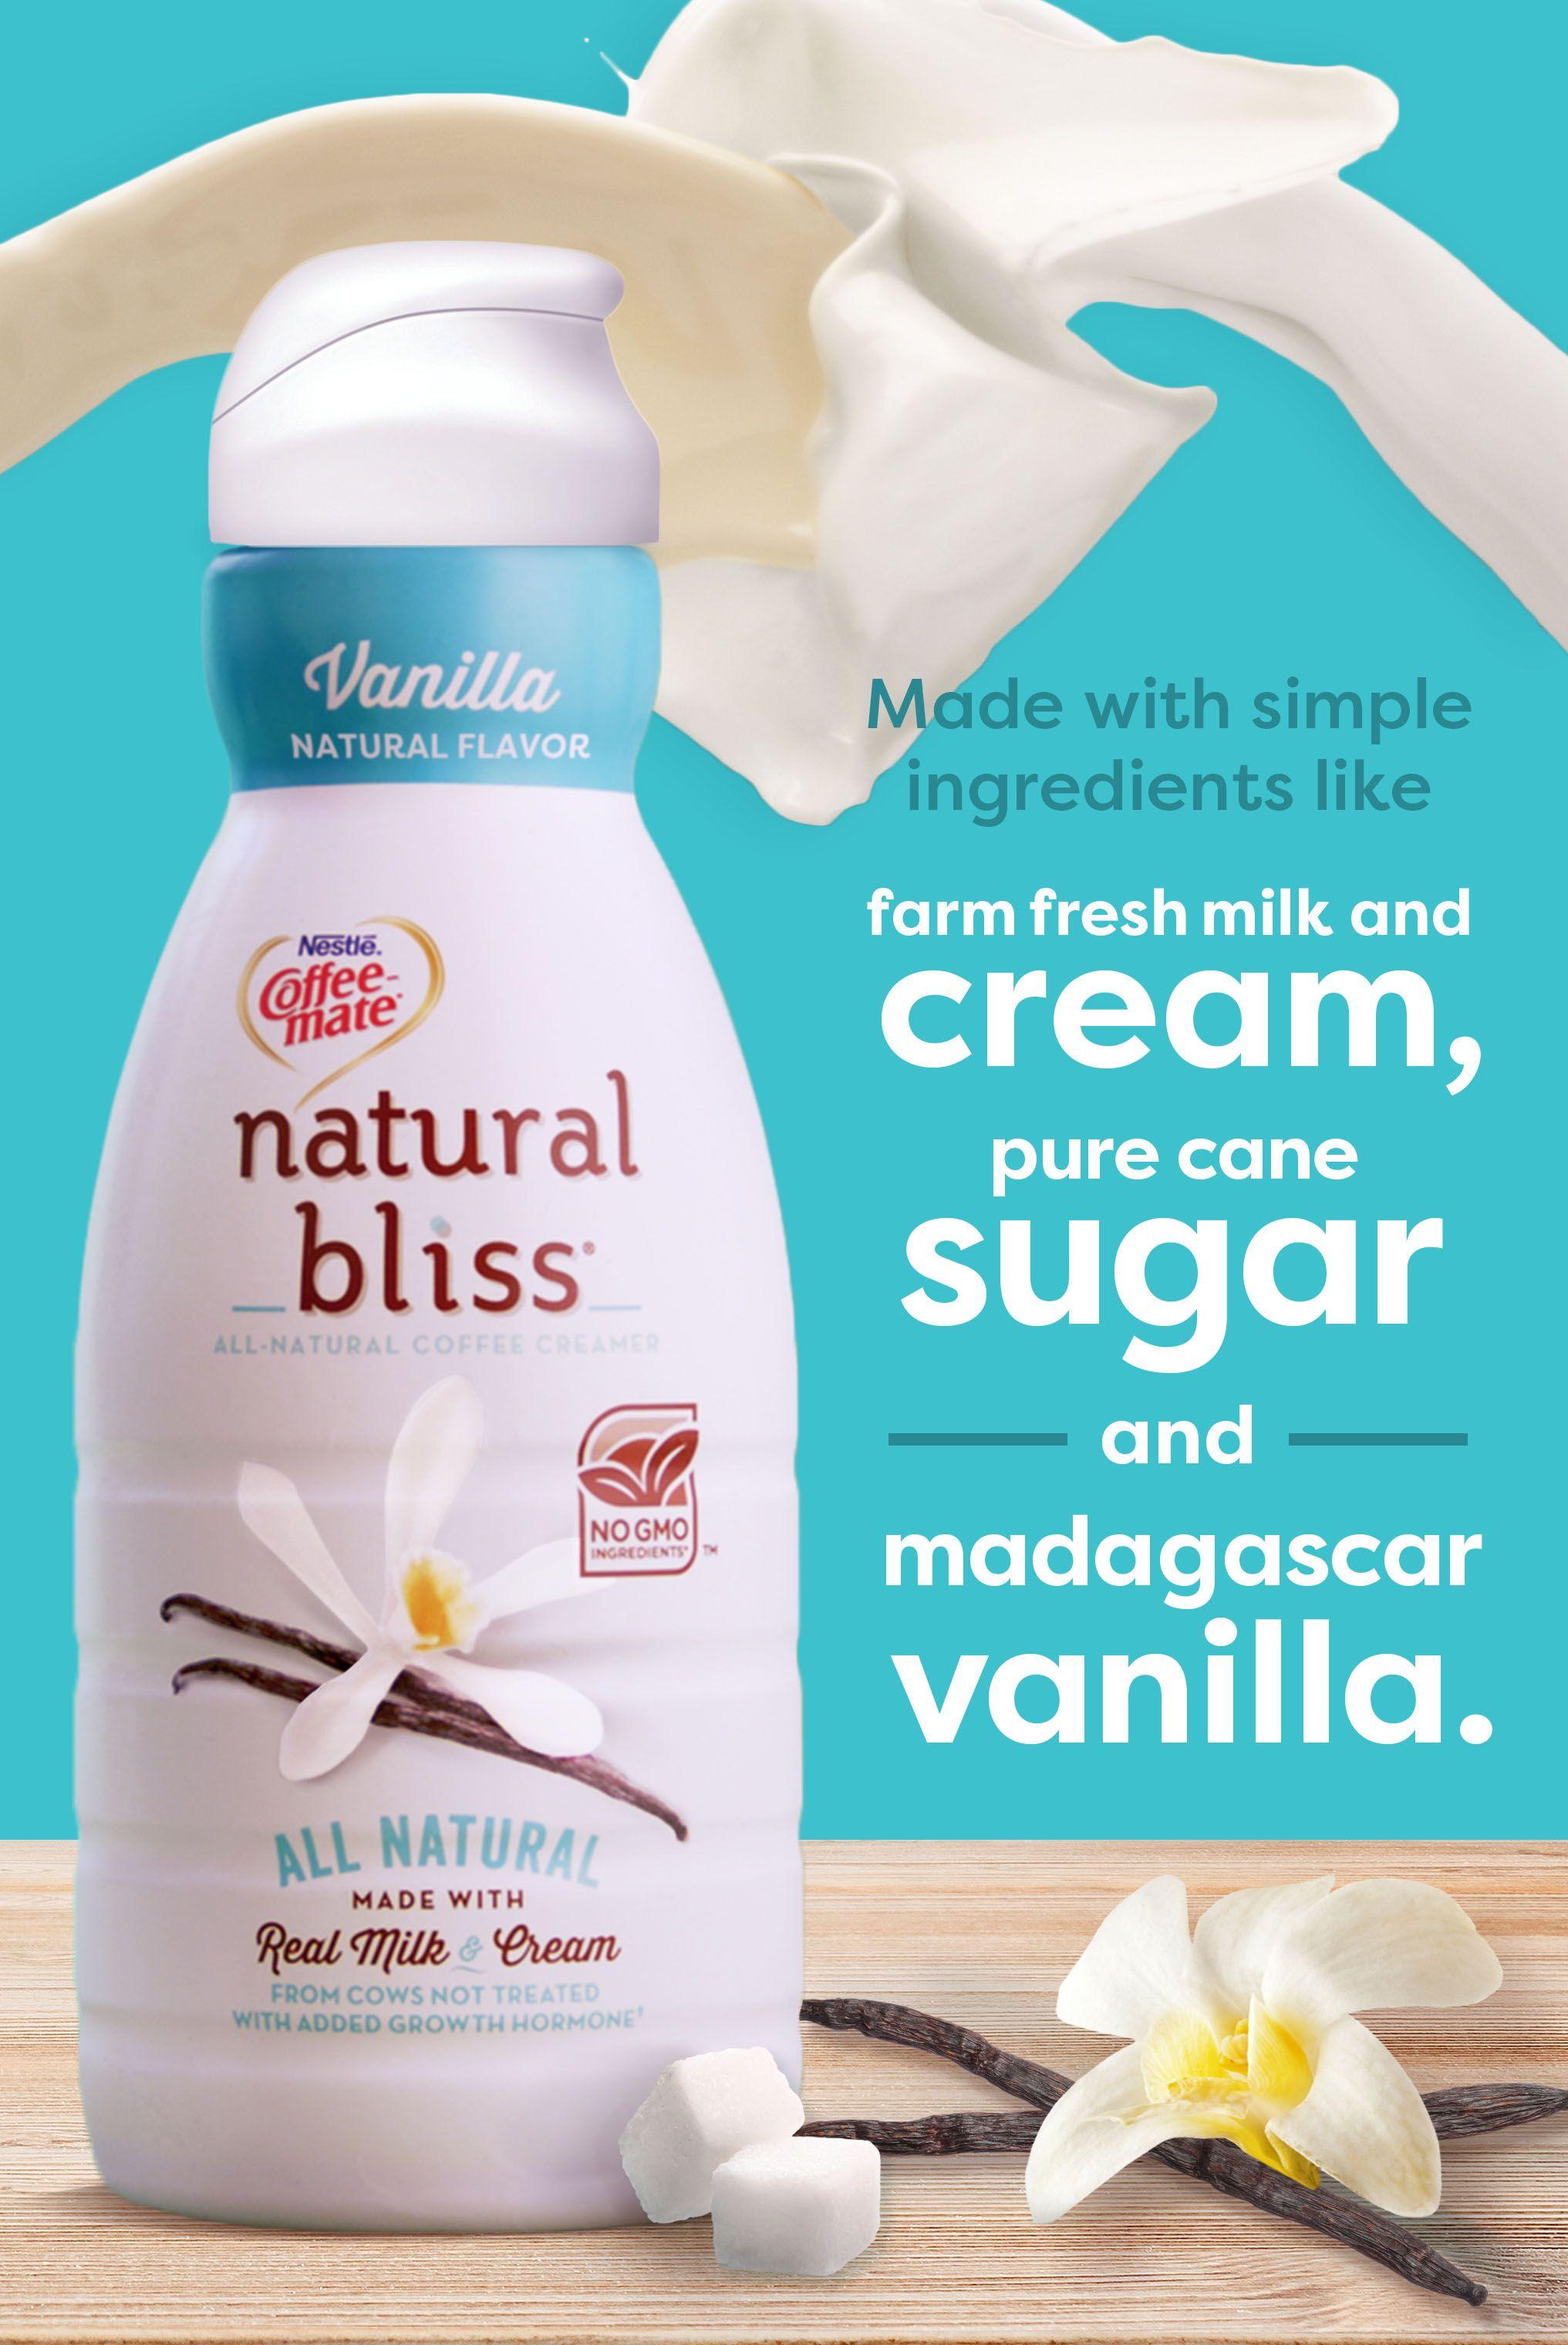 Farm fresh milk and cream, pure cane sugar, and Madagascar